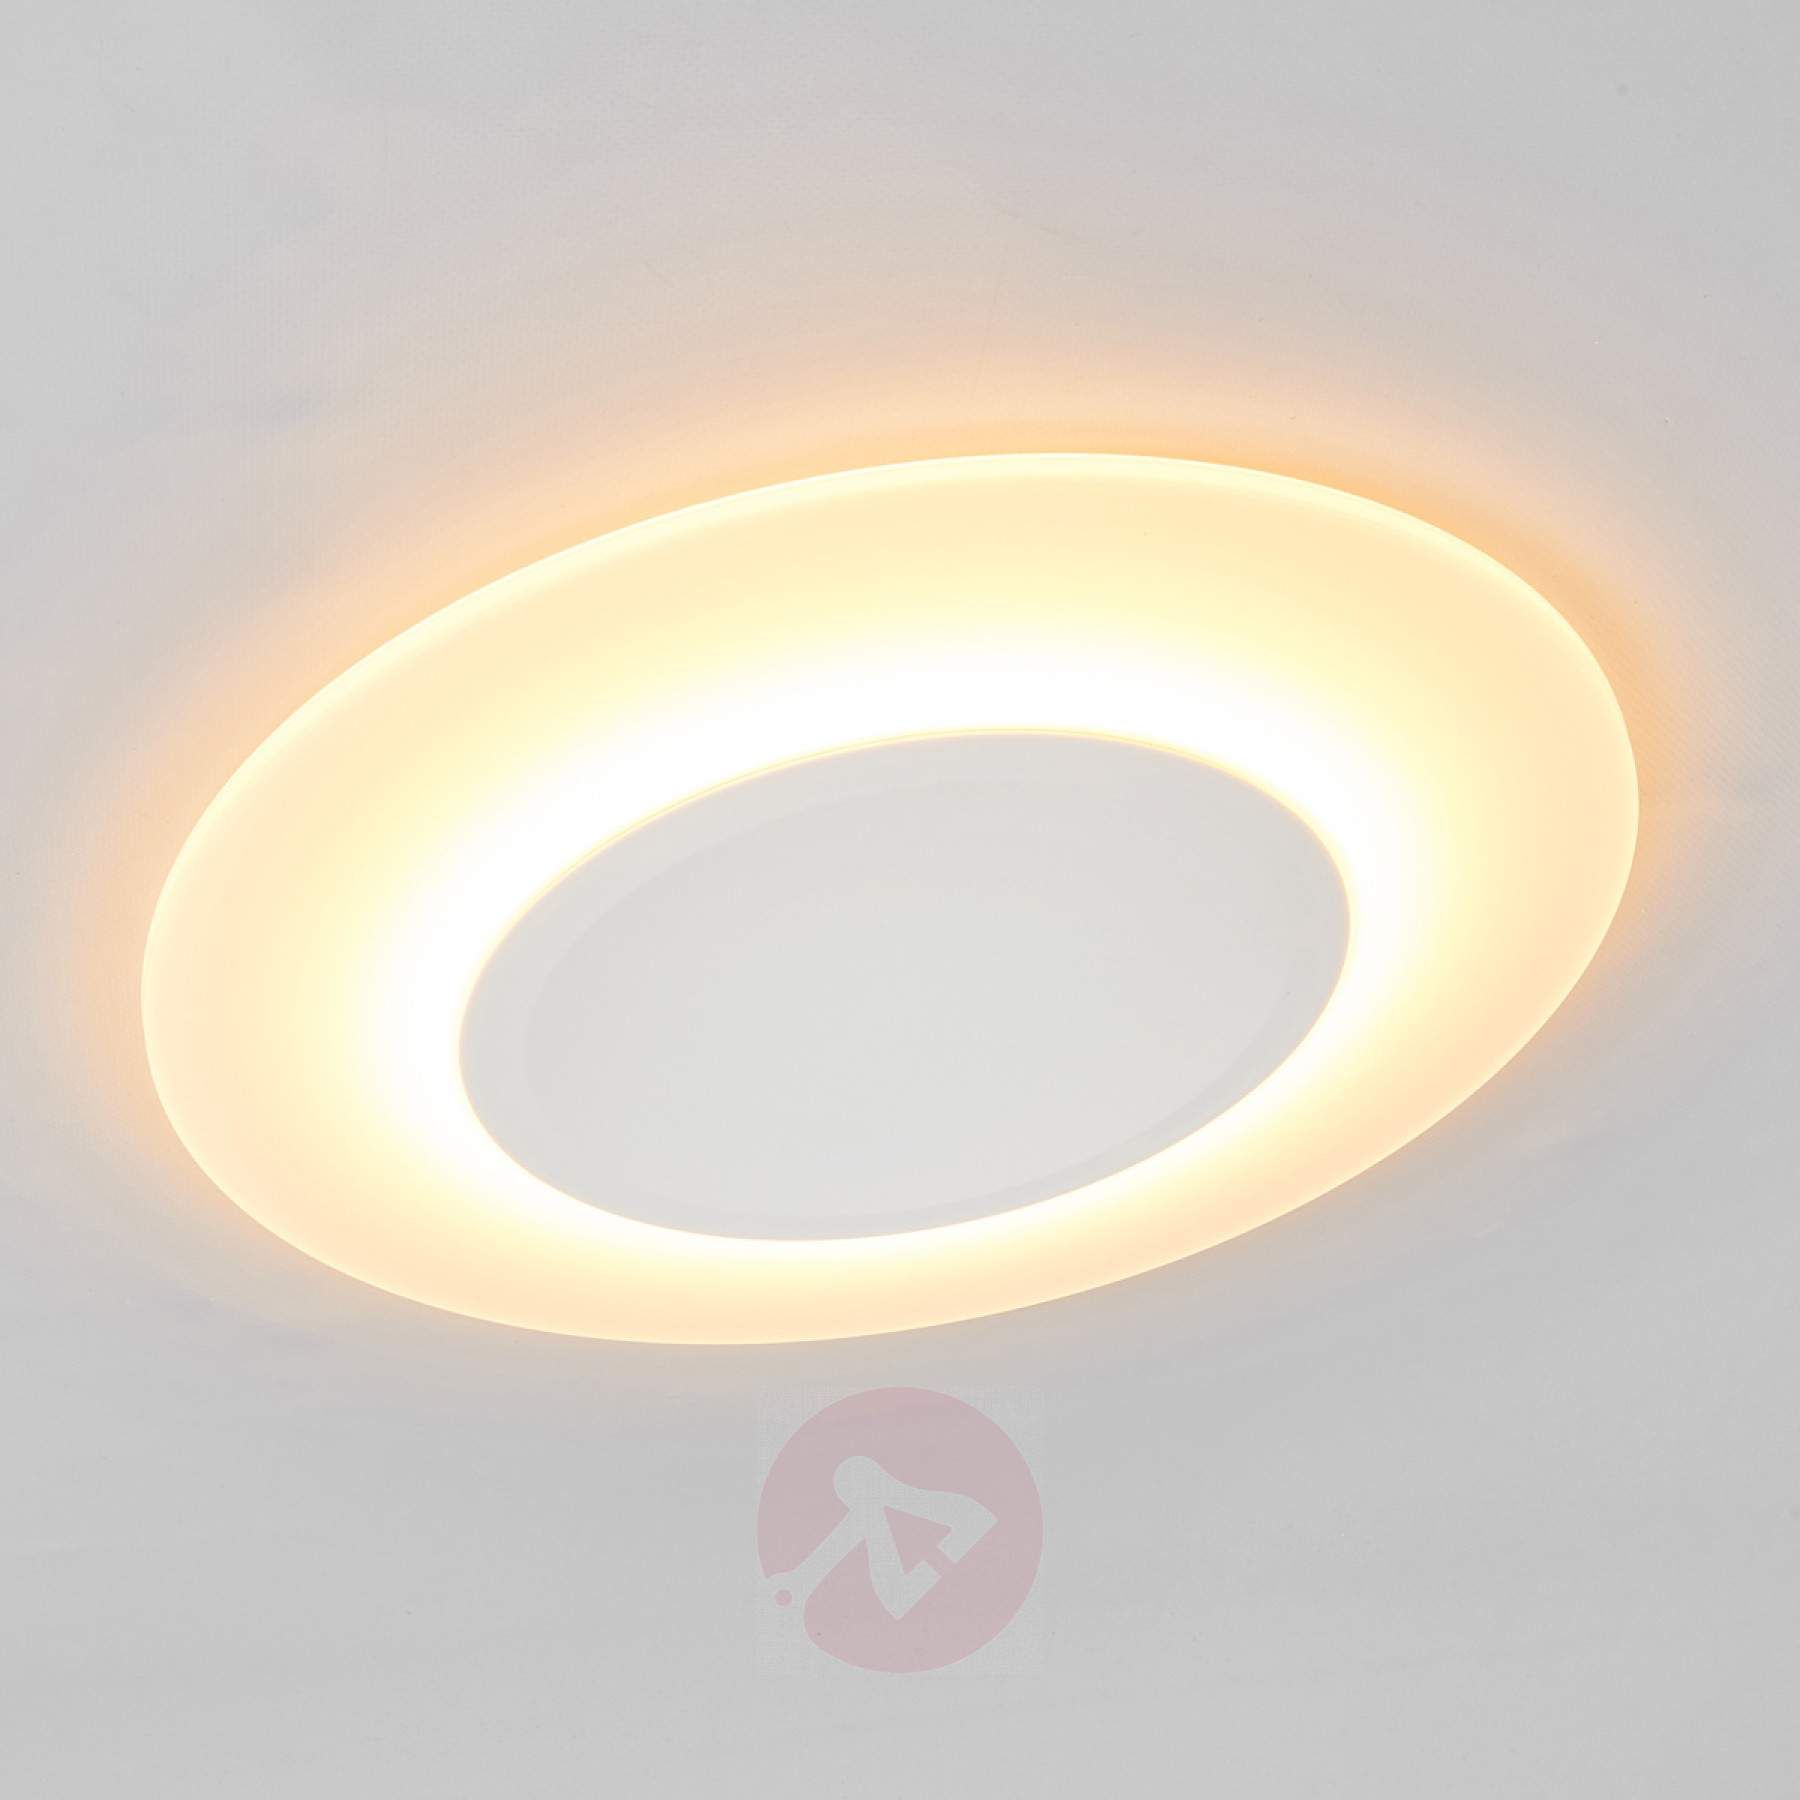 Ledvance Led Flat Flache Led Deckenleuchte Plafondlamp Led